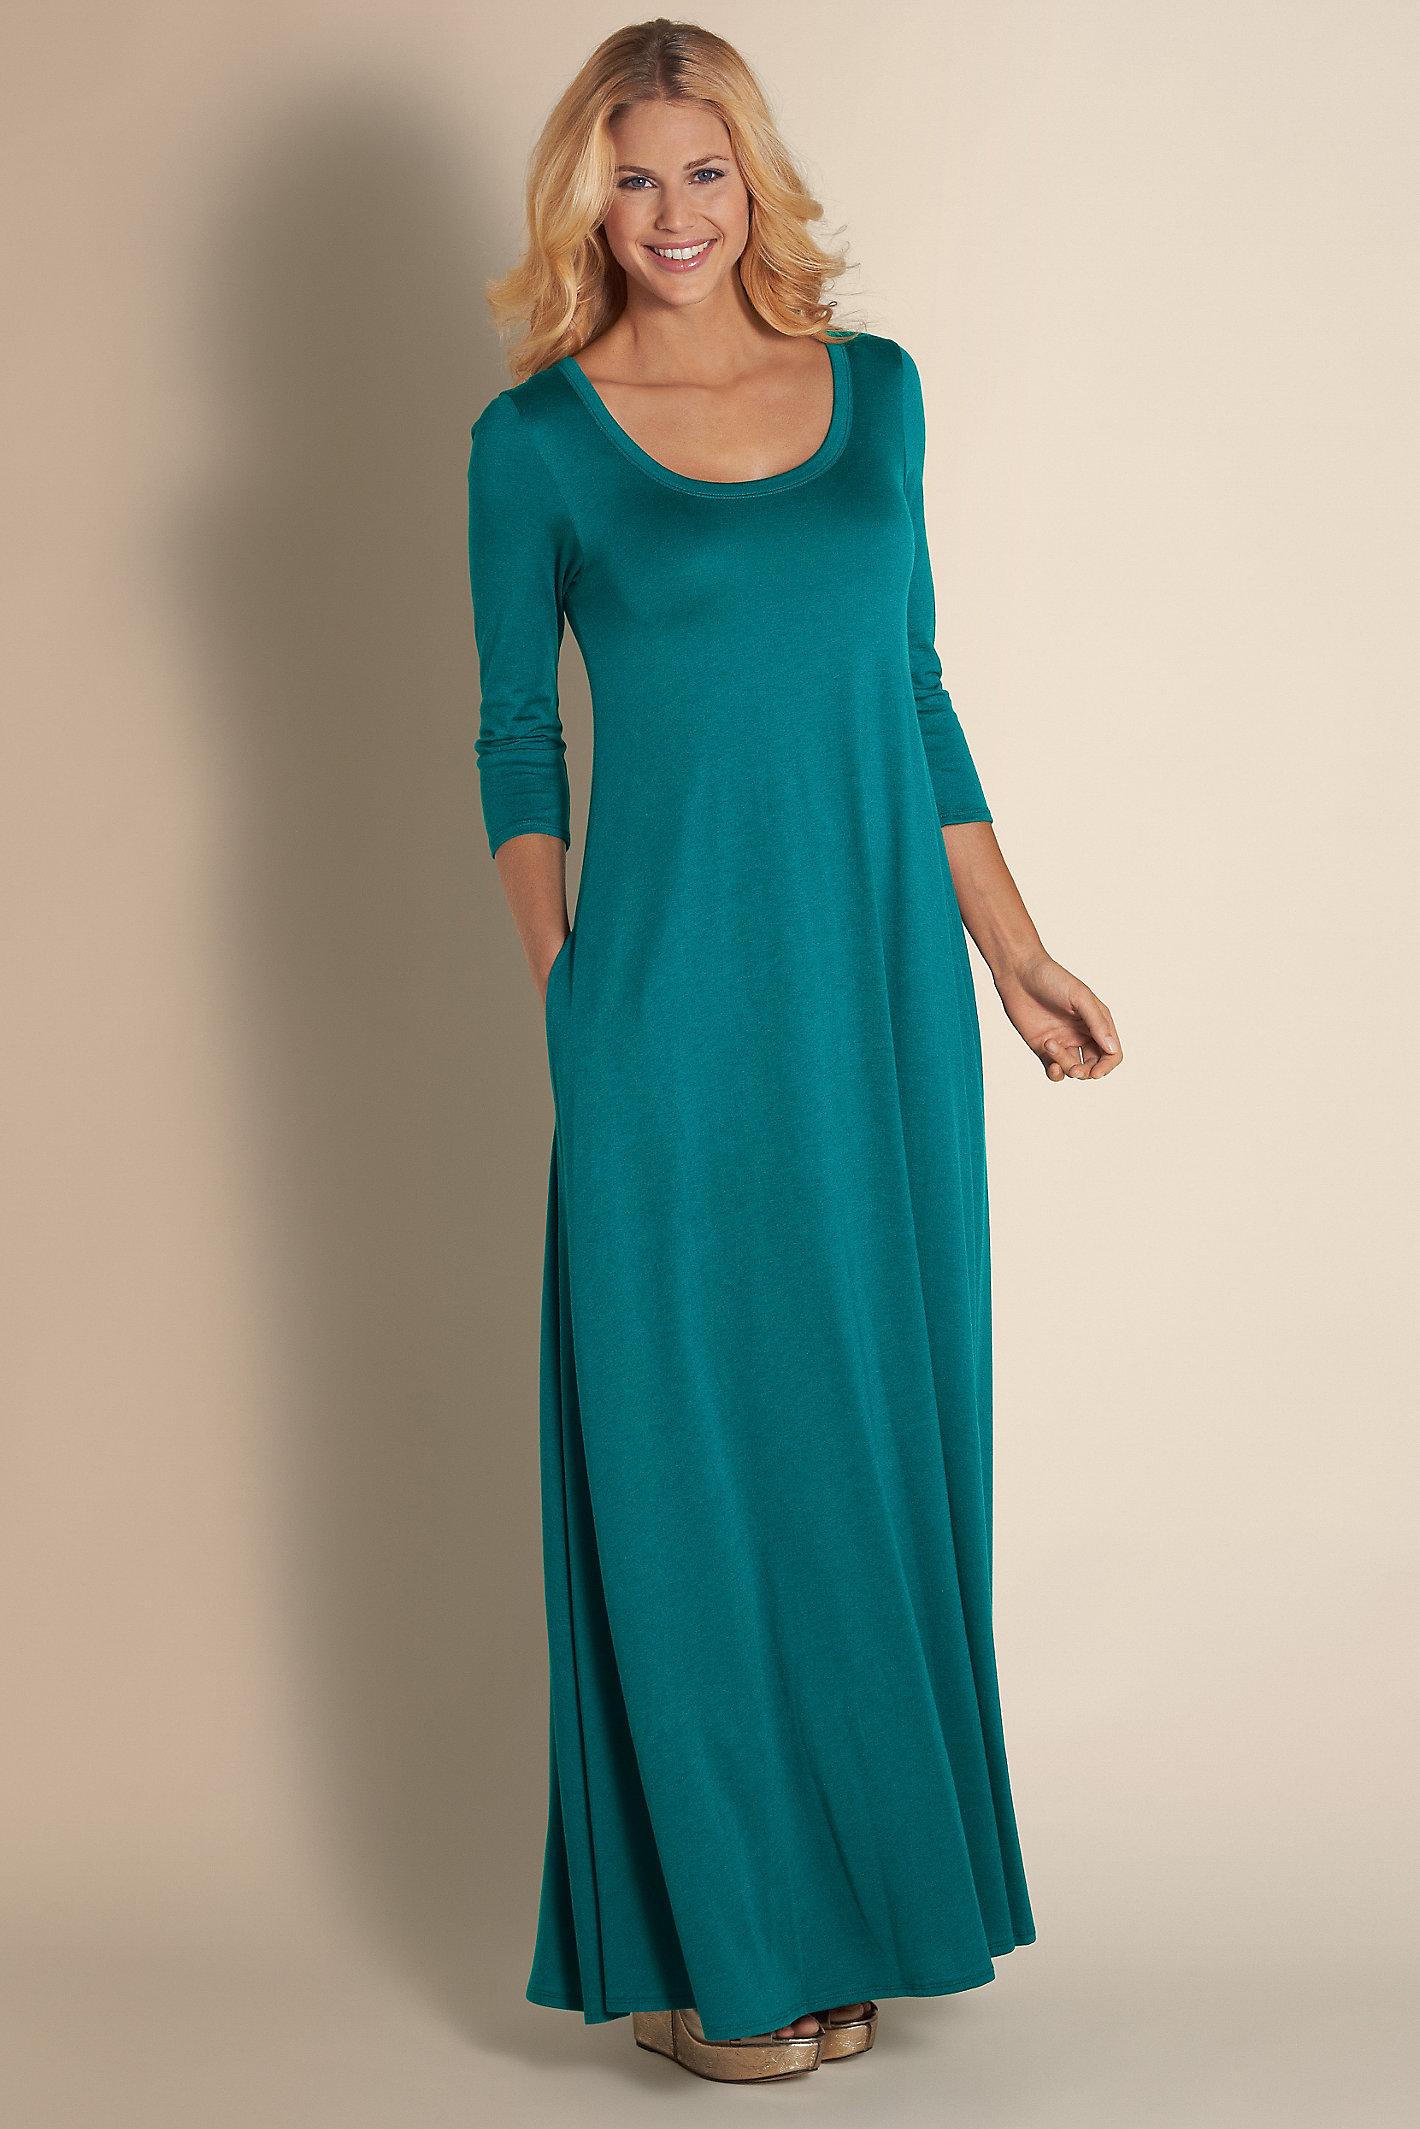 Tll Santiago 3/4 Sleeve Dress